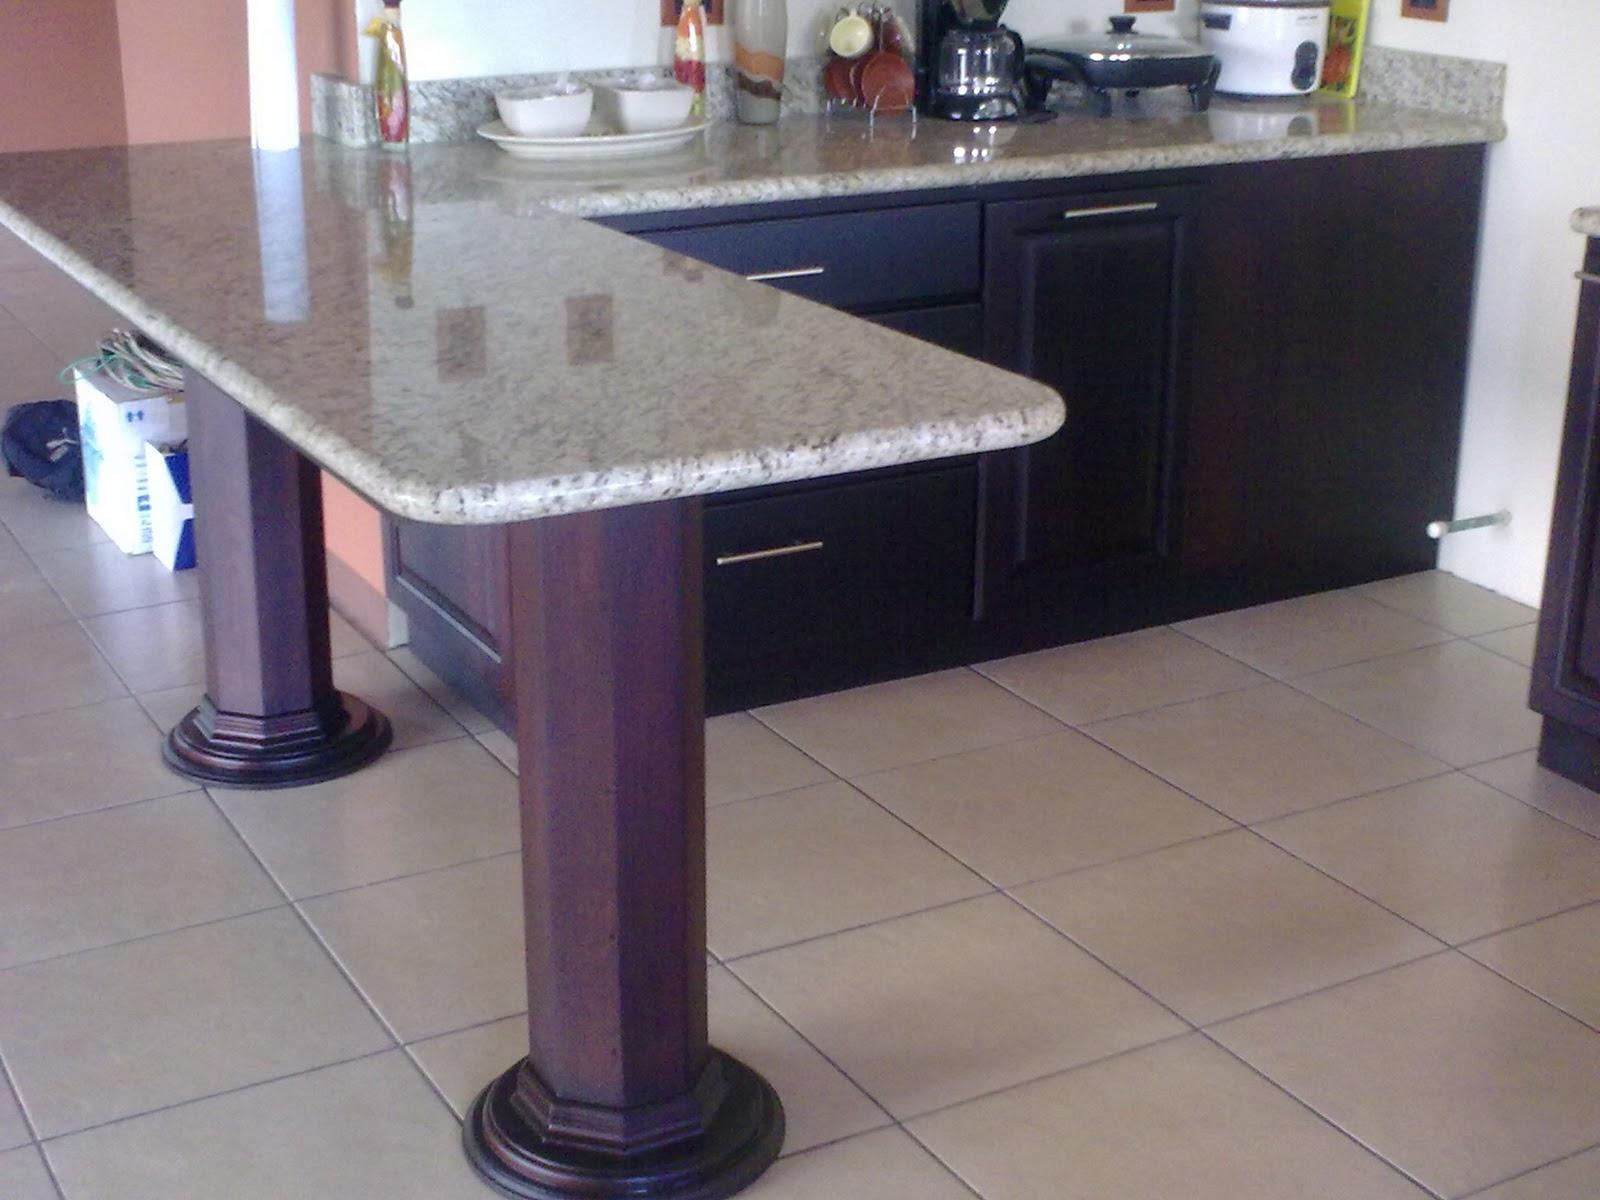 Idearte s a muebles de cocina sobres de granito natural for Muebles de cocina costa rica